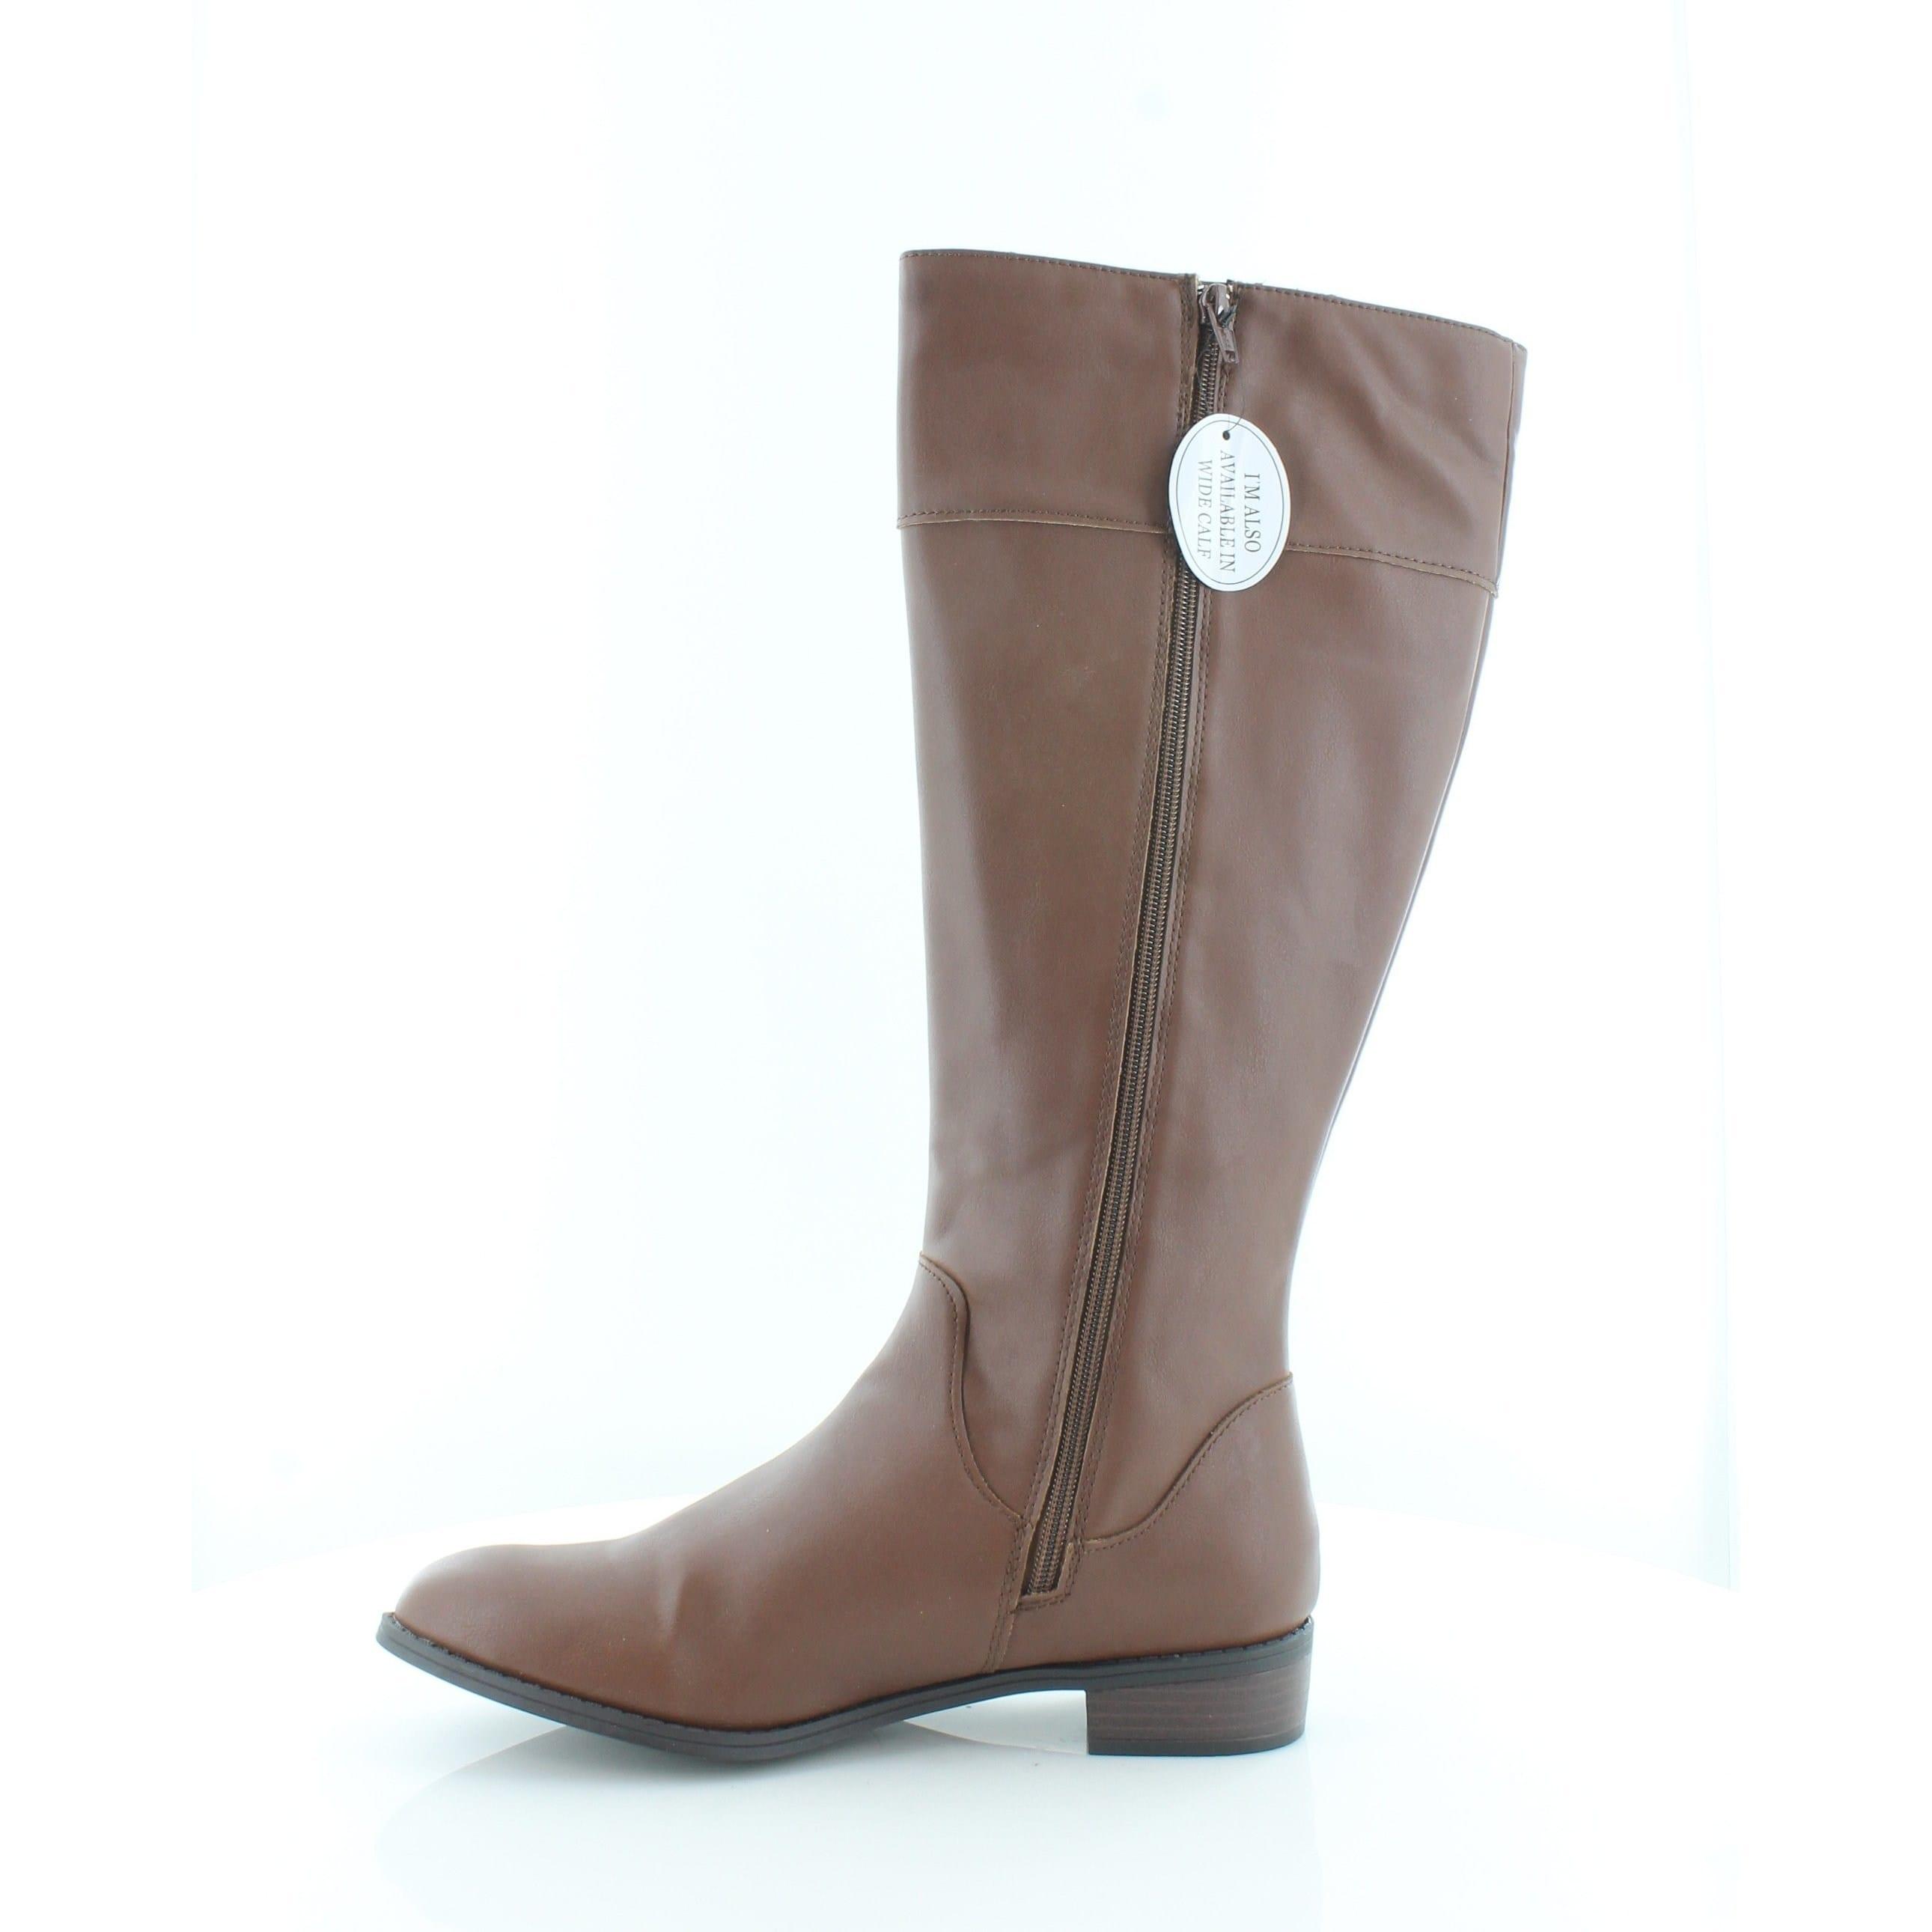 aa1846e0802 Karen Scott Womens Deliee Round Toe Knee High Riding Boots